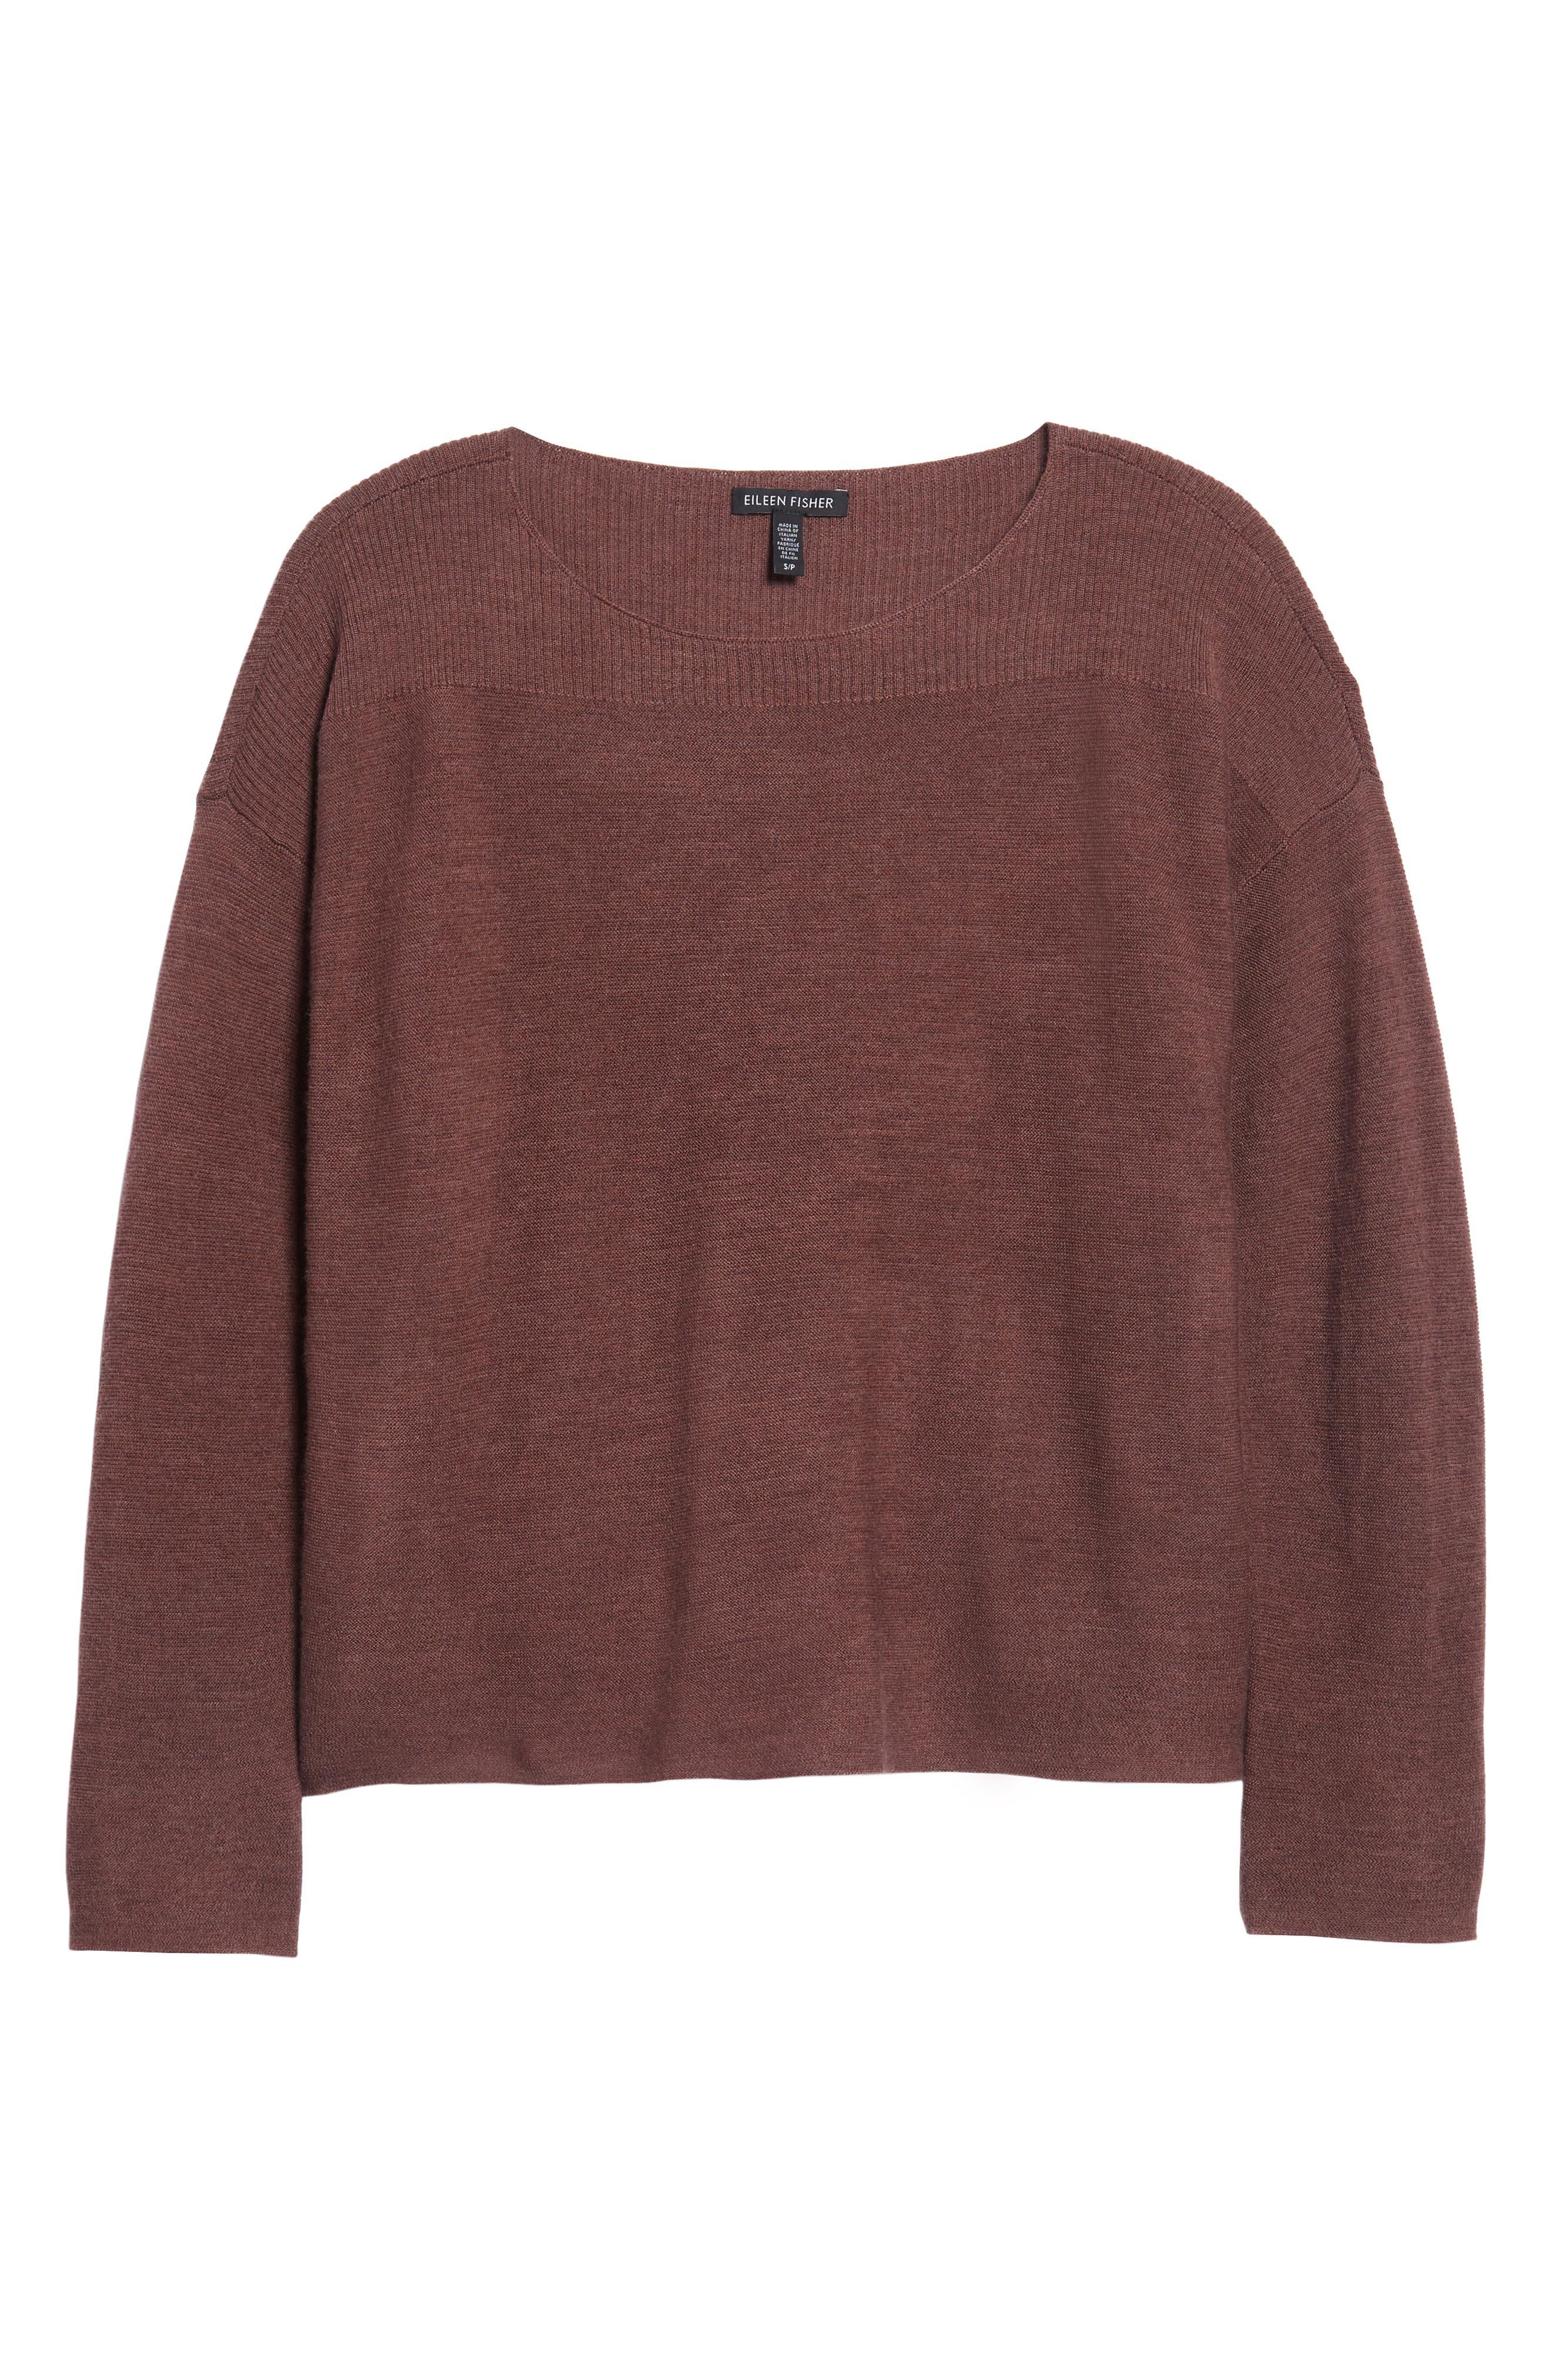 Mix Stitch Merino Bateau Neck Sweater,                             Alternate thumbnail 6, color,                             216